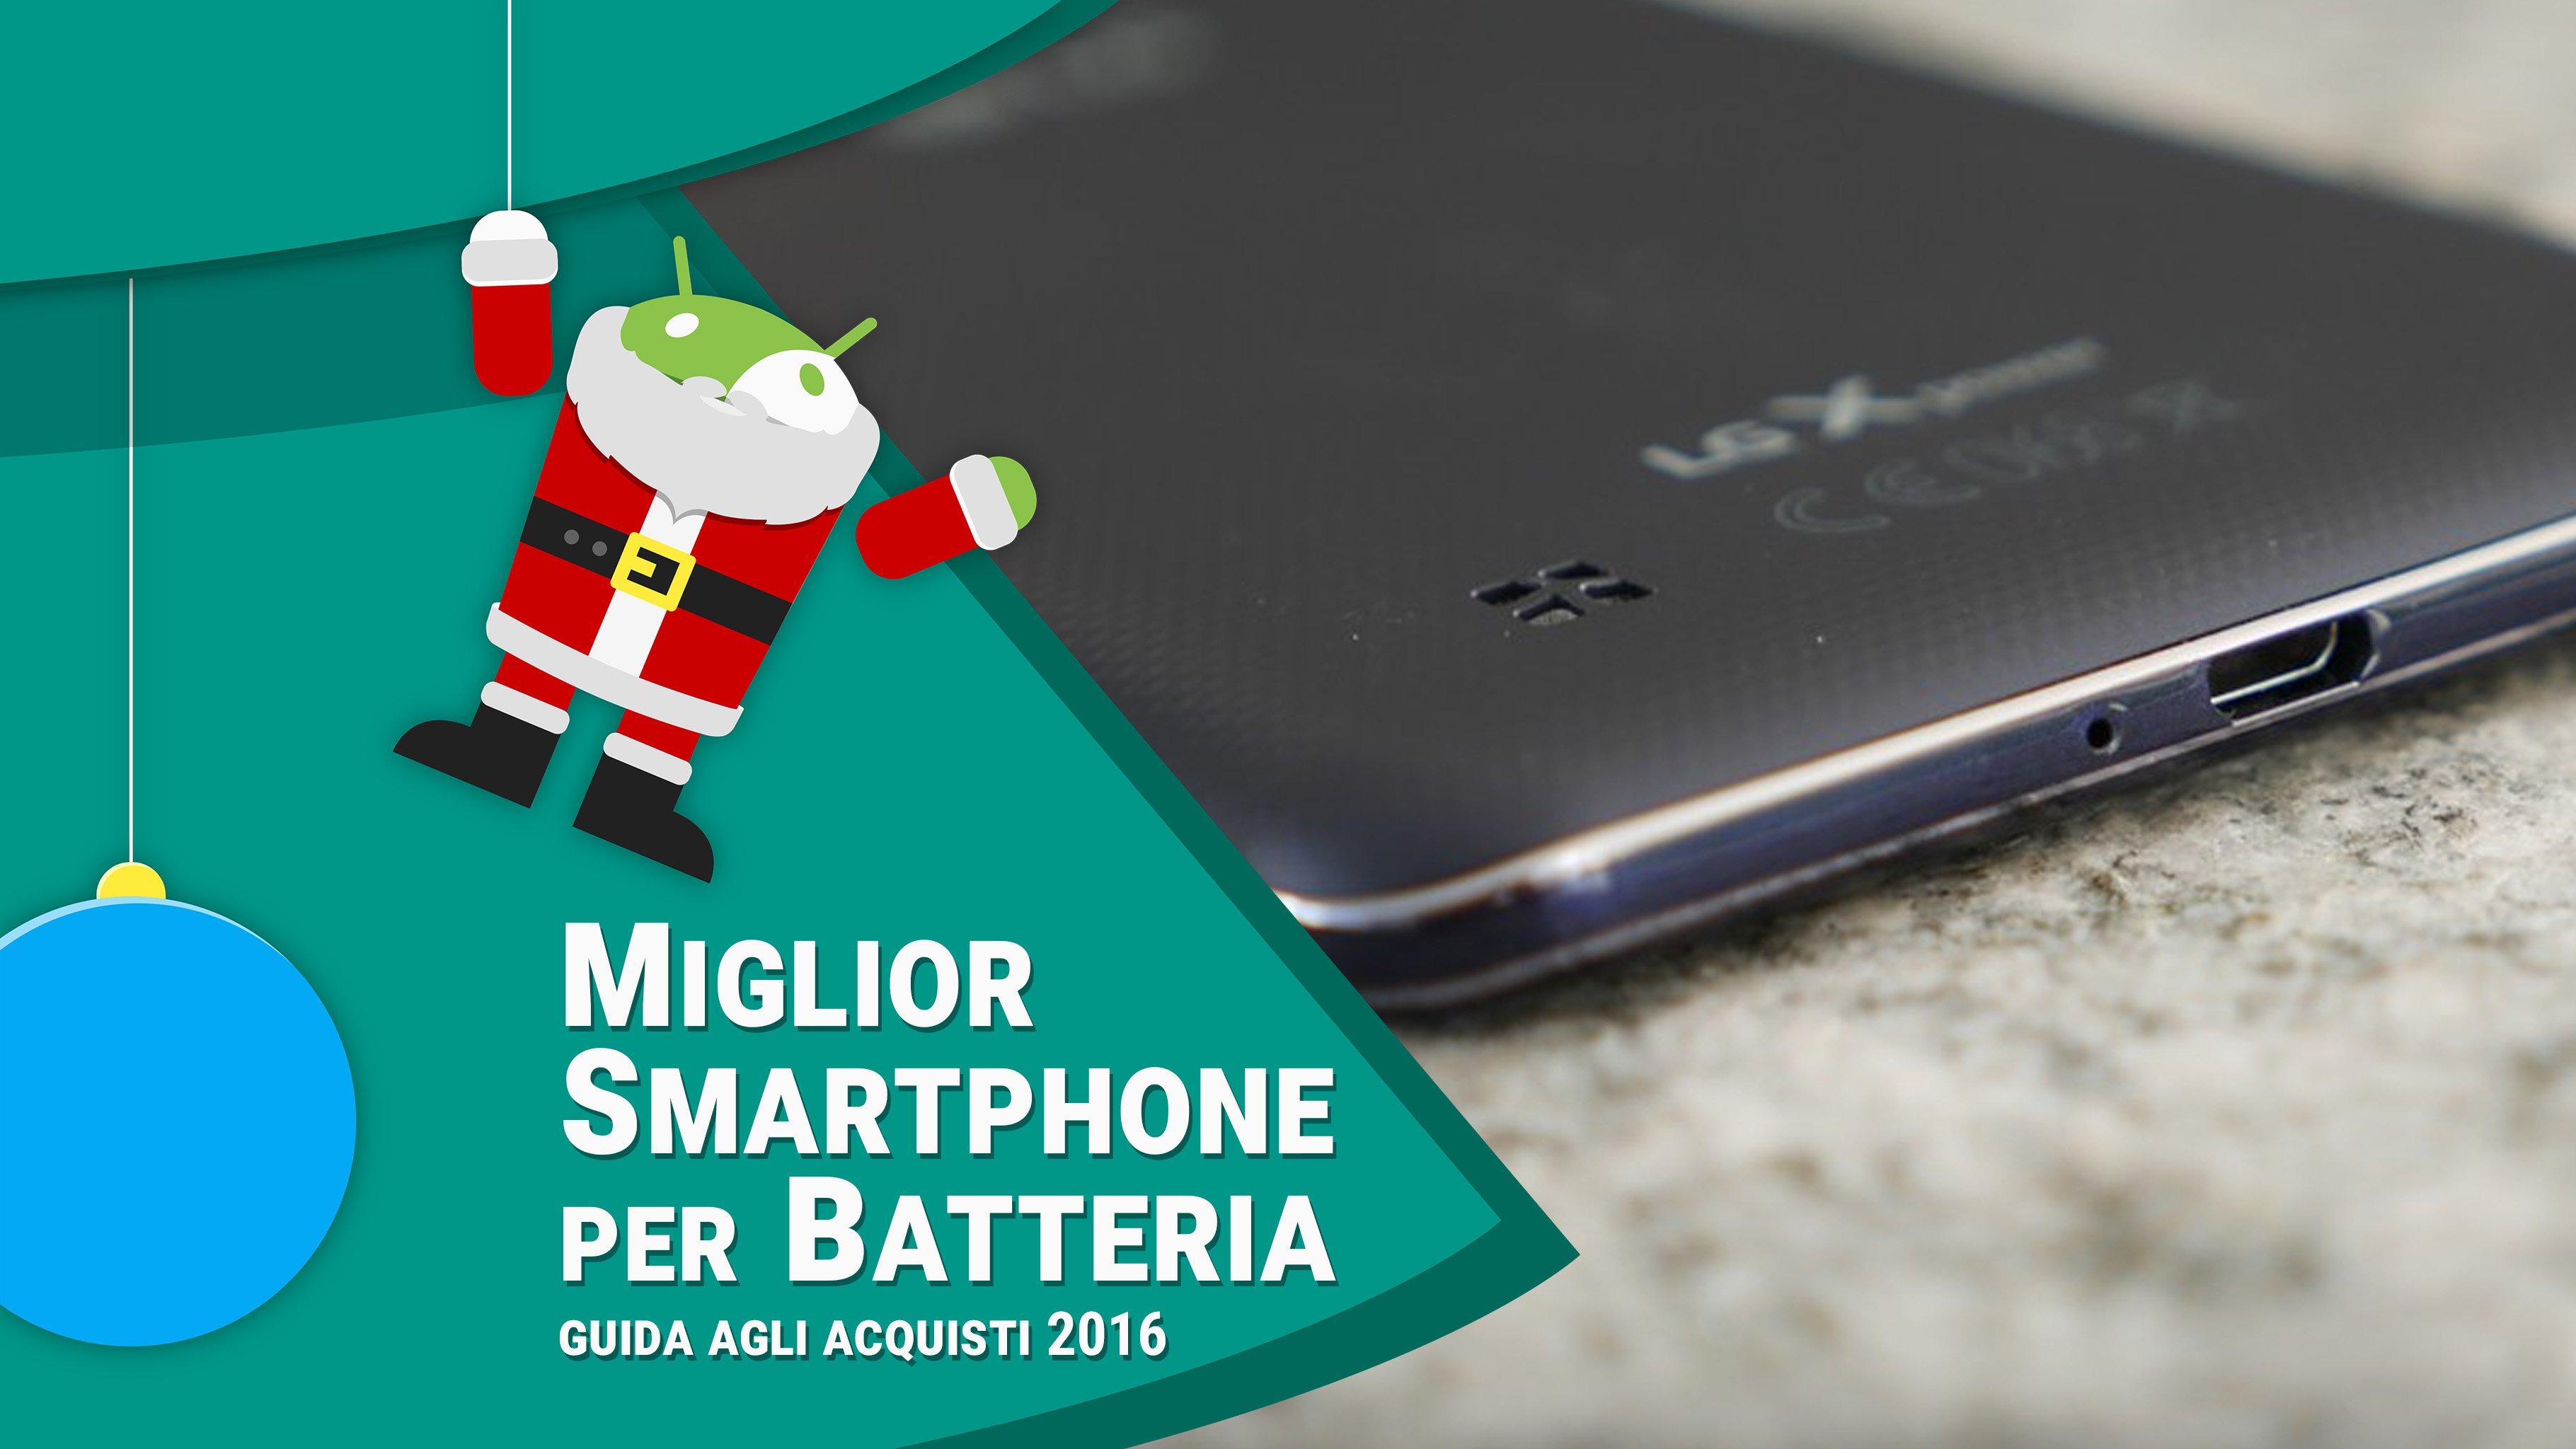 Miglior smartphone android per batteria gennaio 2017 - Miglior antifurto casa forum ...